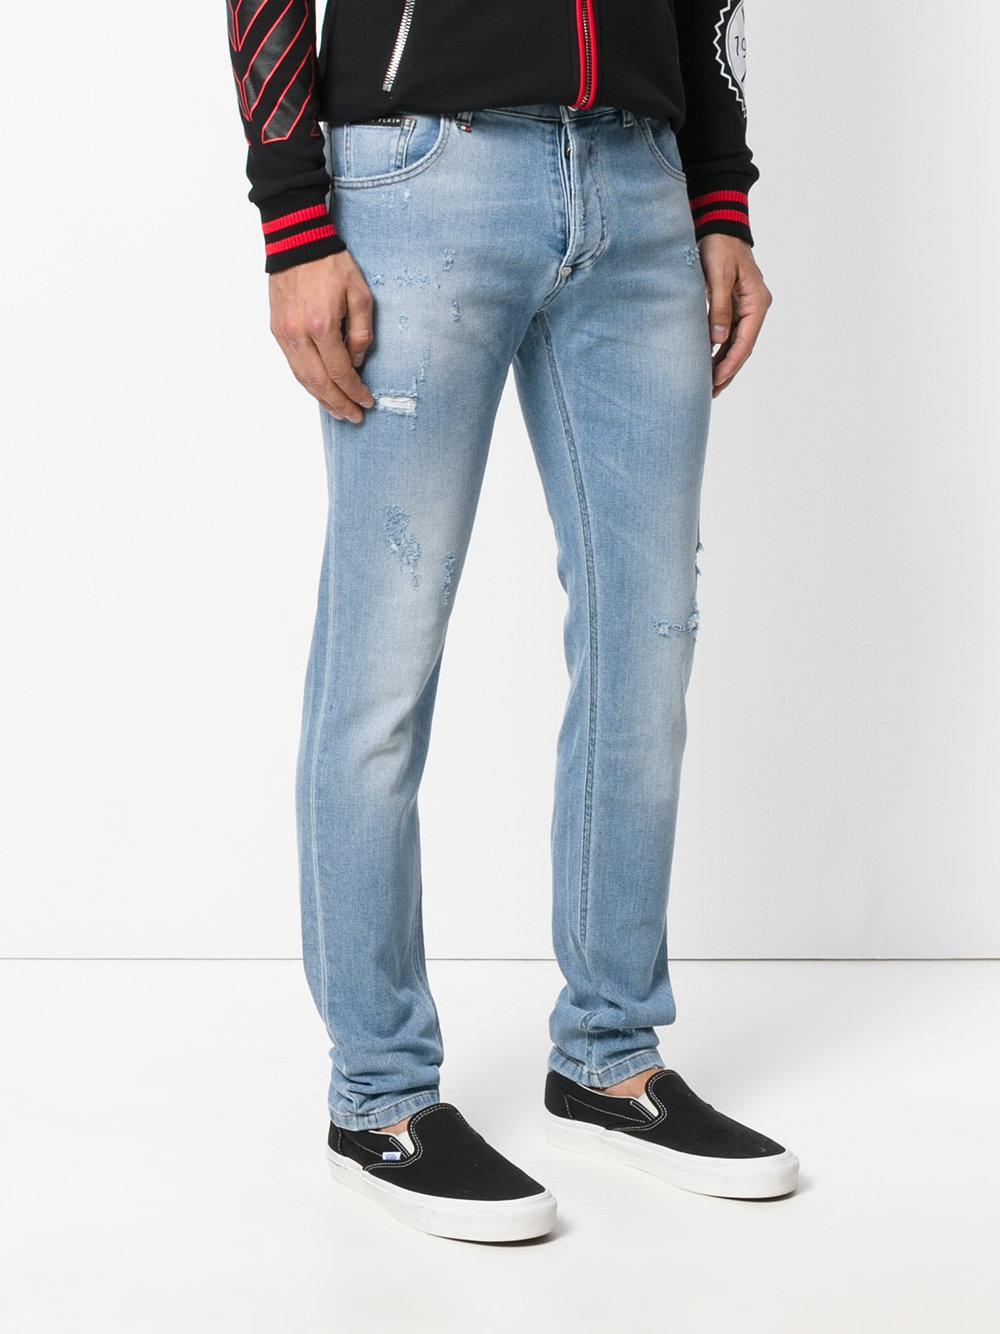 lyst philipp plein classic skinny jeans in blue for men. Black Bedroom Furniture Sets. Home Design Ideas